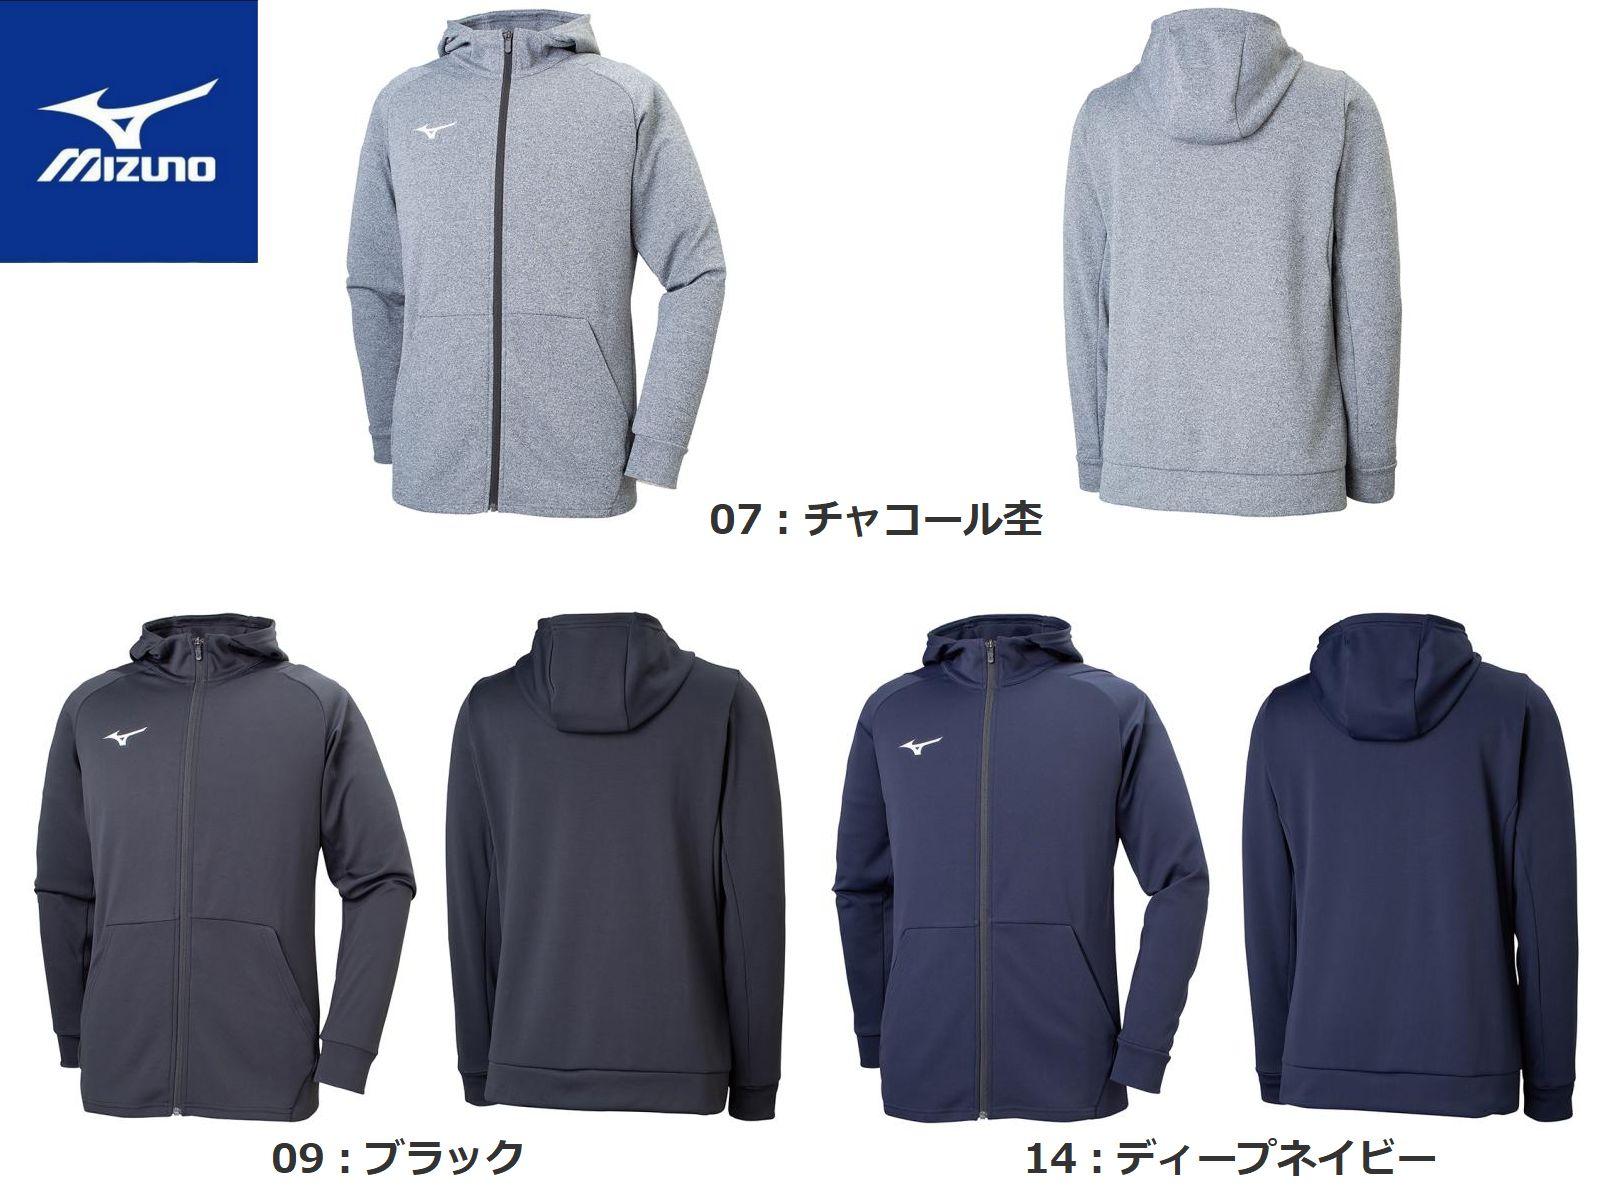 【Mizuno=ミズノ】トレーニング ウェアソフトニットパーカー(フルジップ)[ユニセックス][チャコール杢][ブラック][ディープネイビー][XS、S、M、L、XL、2XL、3XL]全スポーツに!